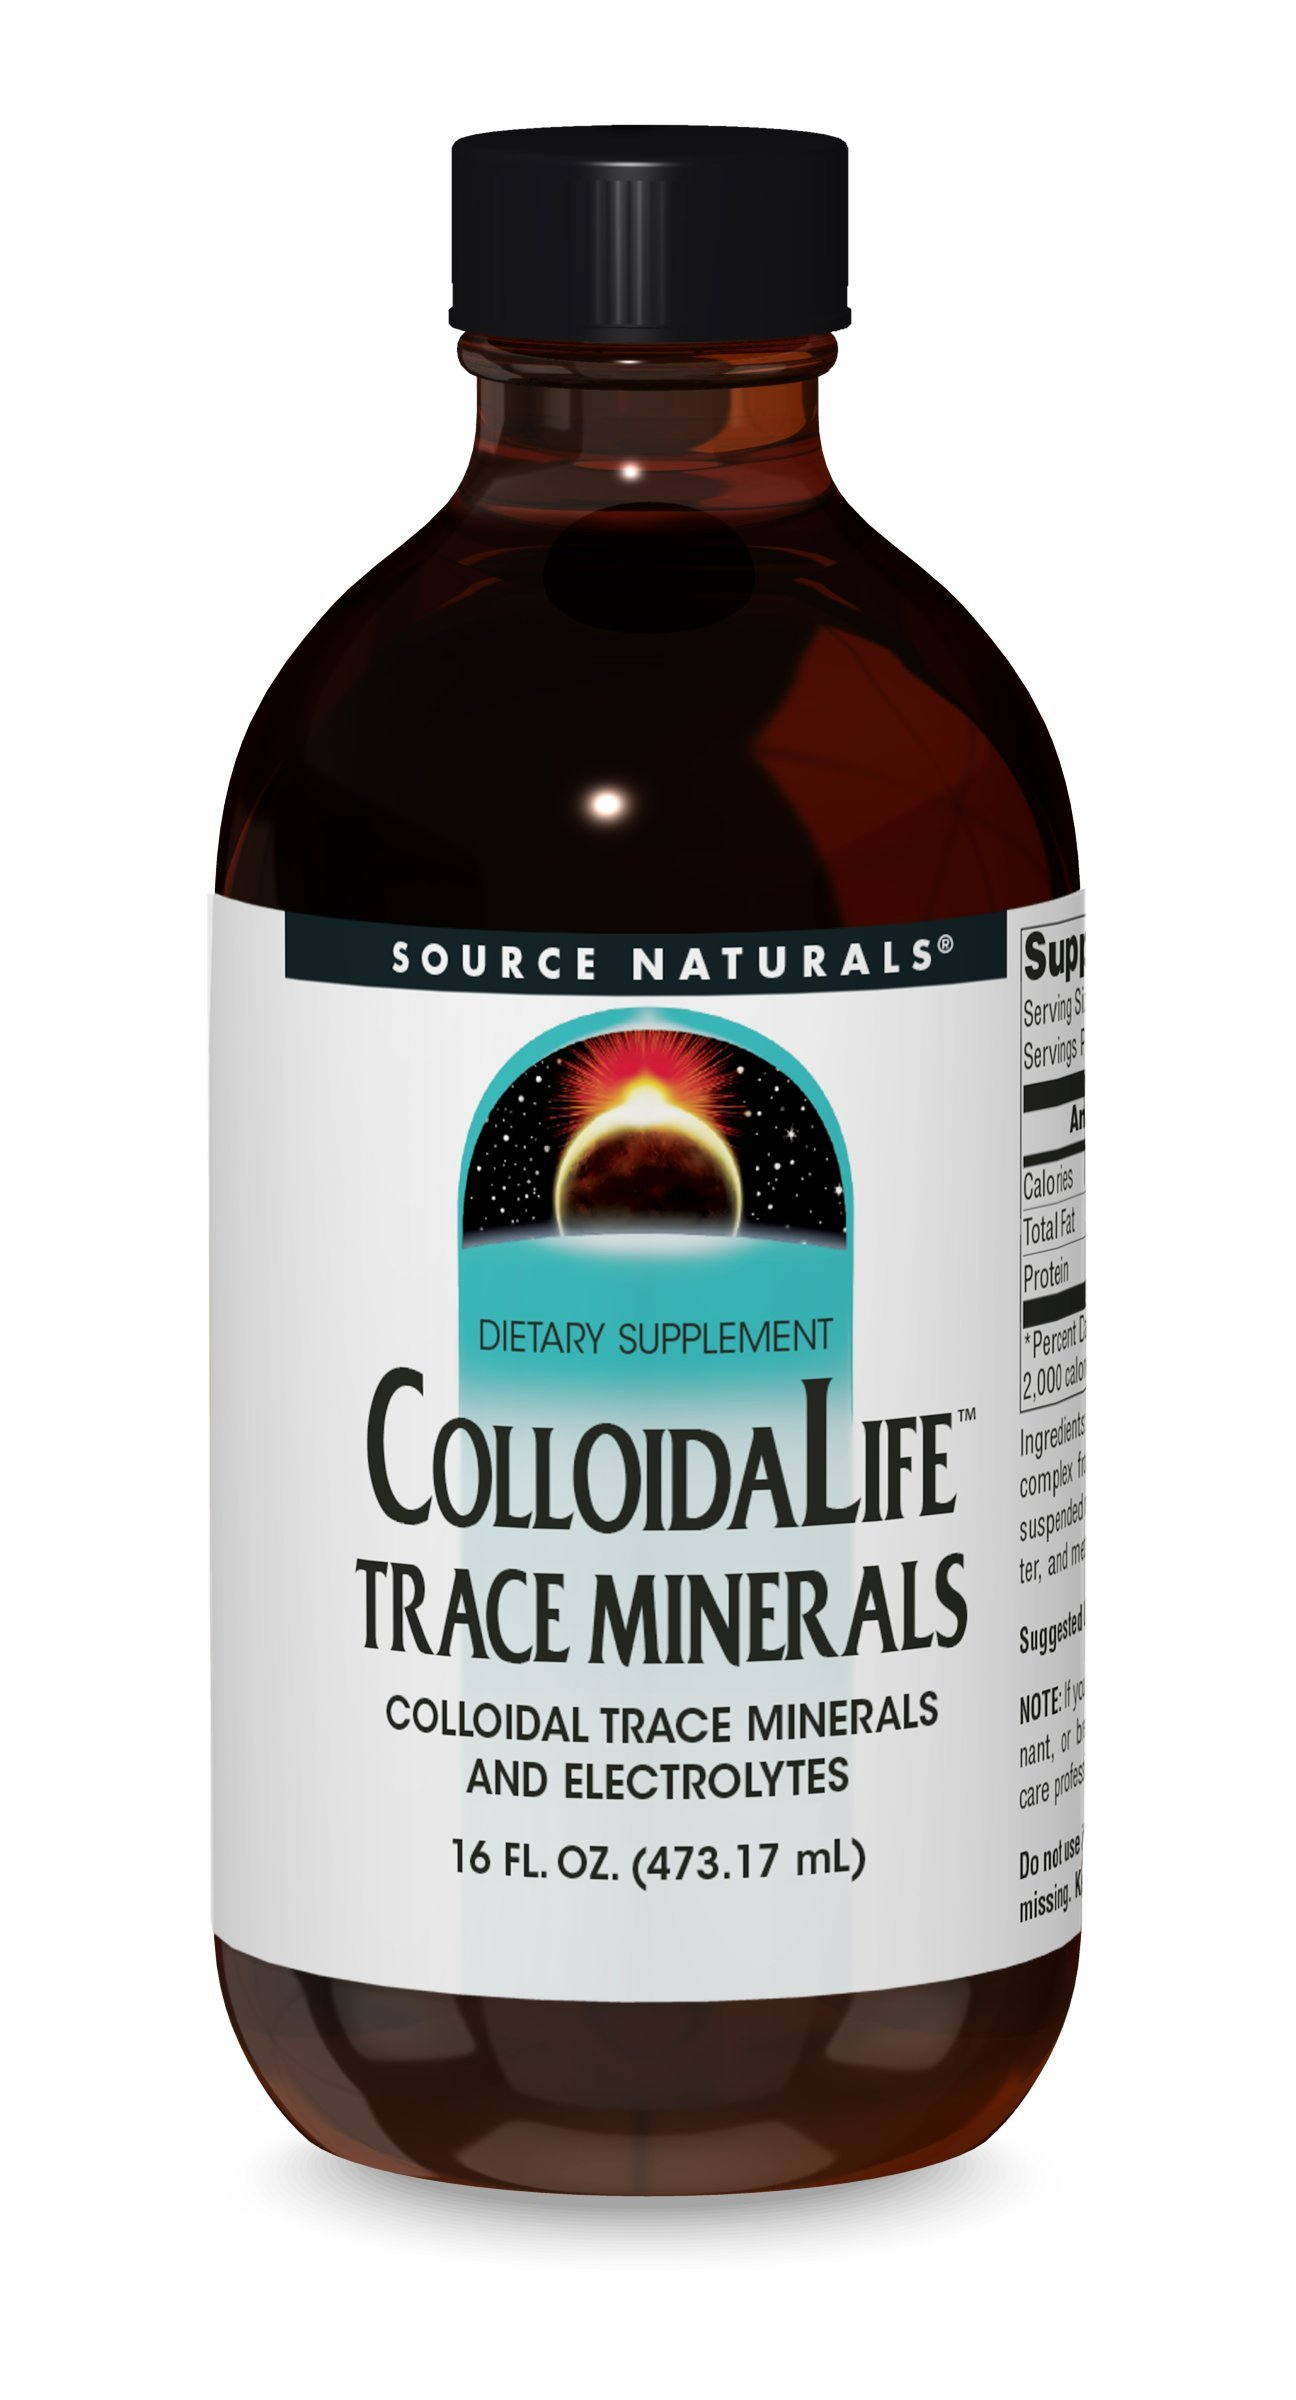 Source Naturals Colloida Life Trace Minerals Collidal Trace Minerals & Electrolytes - Dietary Supplement - Pure Source of Calcium, Chromium, Copper, Potassium, Zinc & More - 100% Pure - 16oz